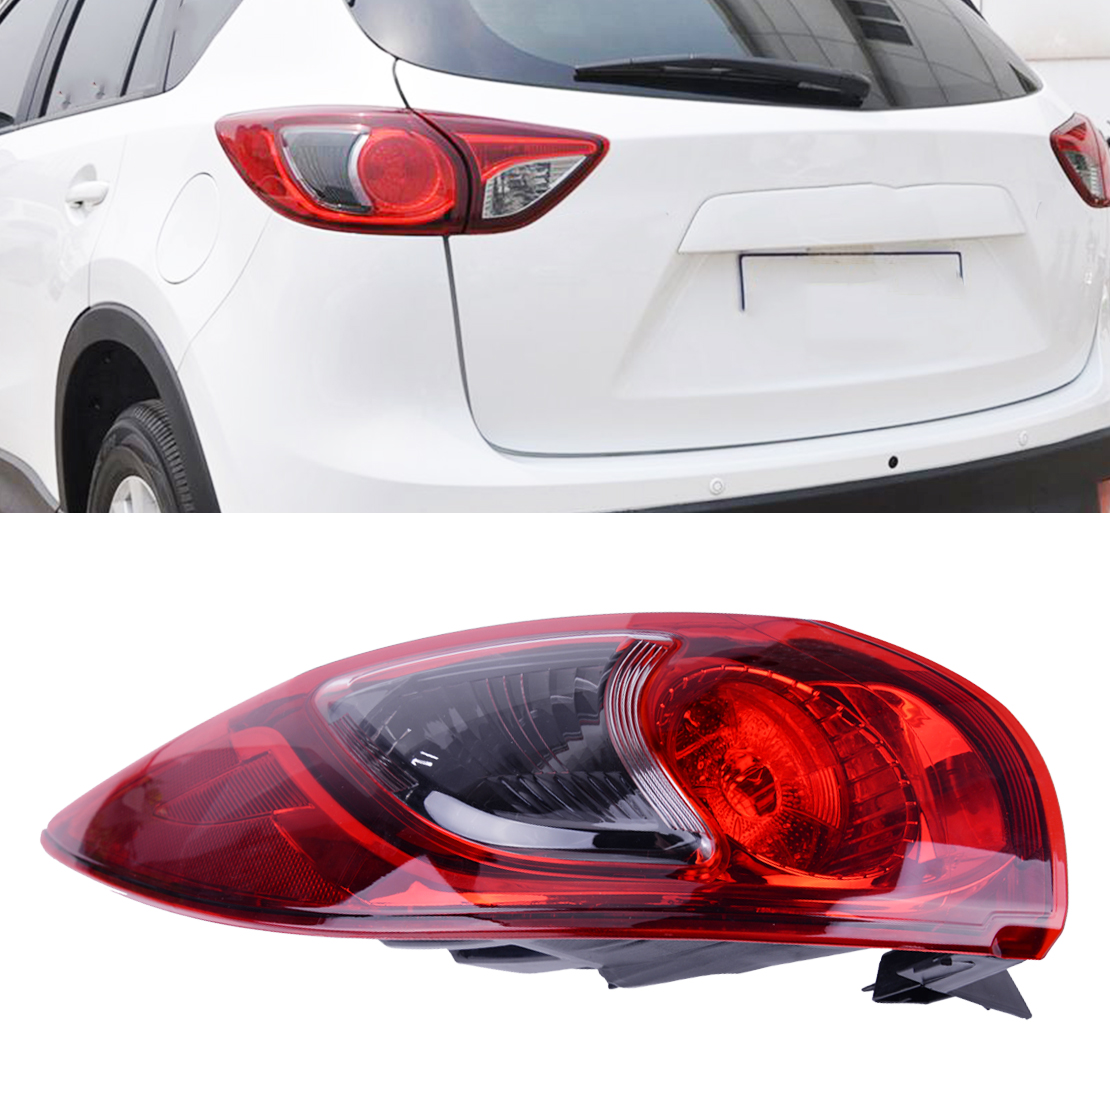 Mazda CX-5 Passenger/'s Side Tail Lamp 2013 2014 2015 2016 KD3351150C